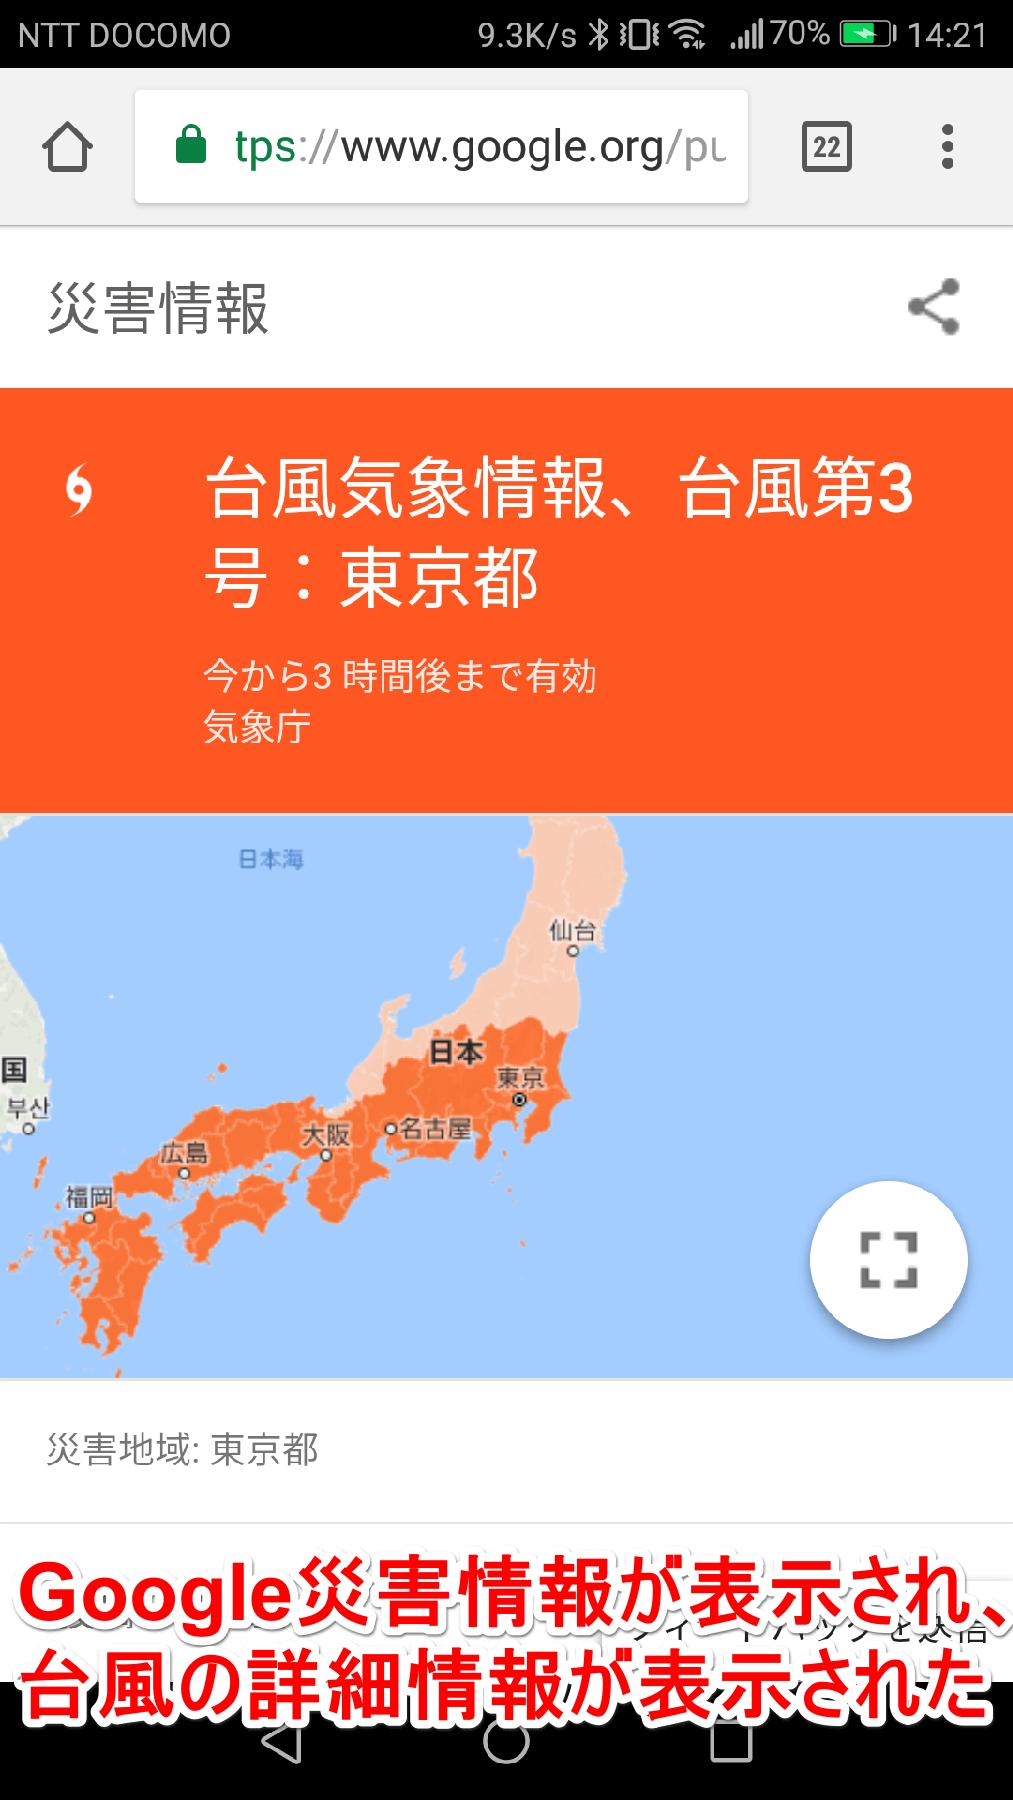 "Google(グーグル)の[災害情報]画面"""